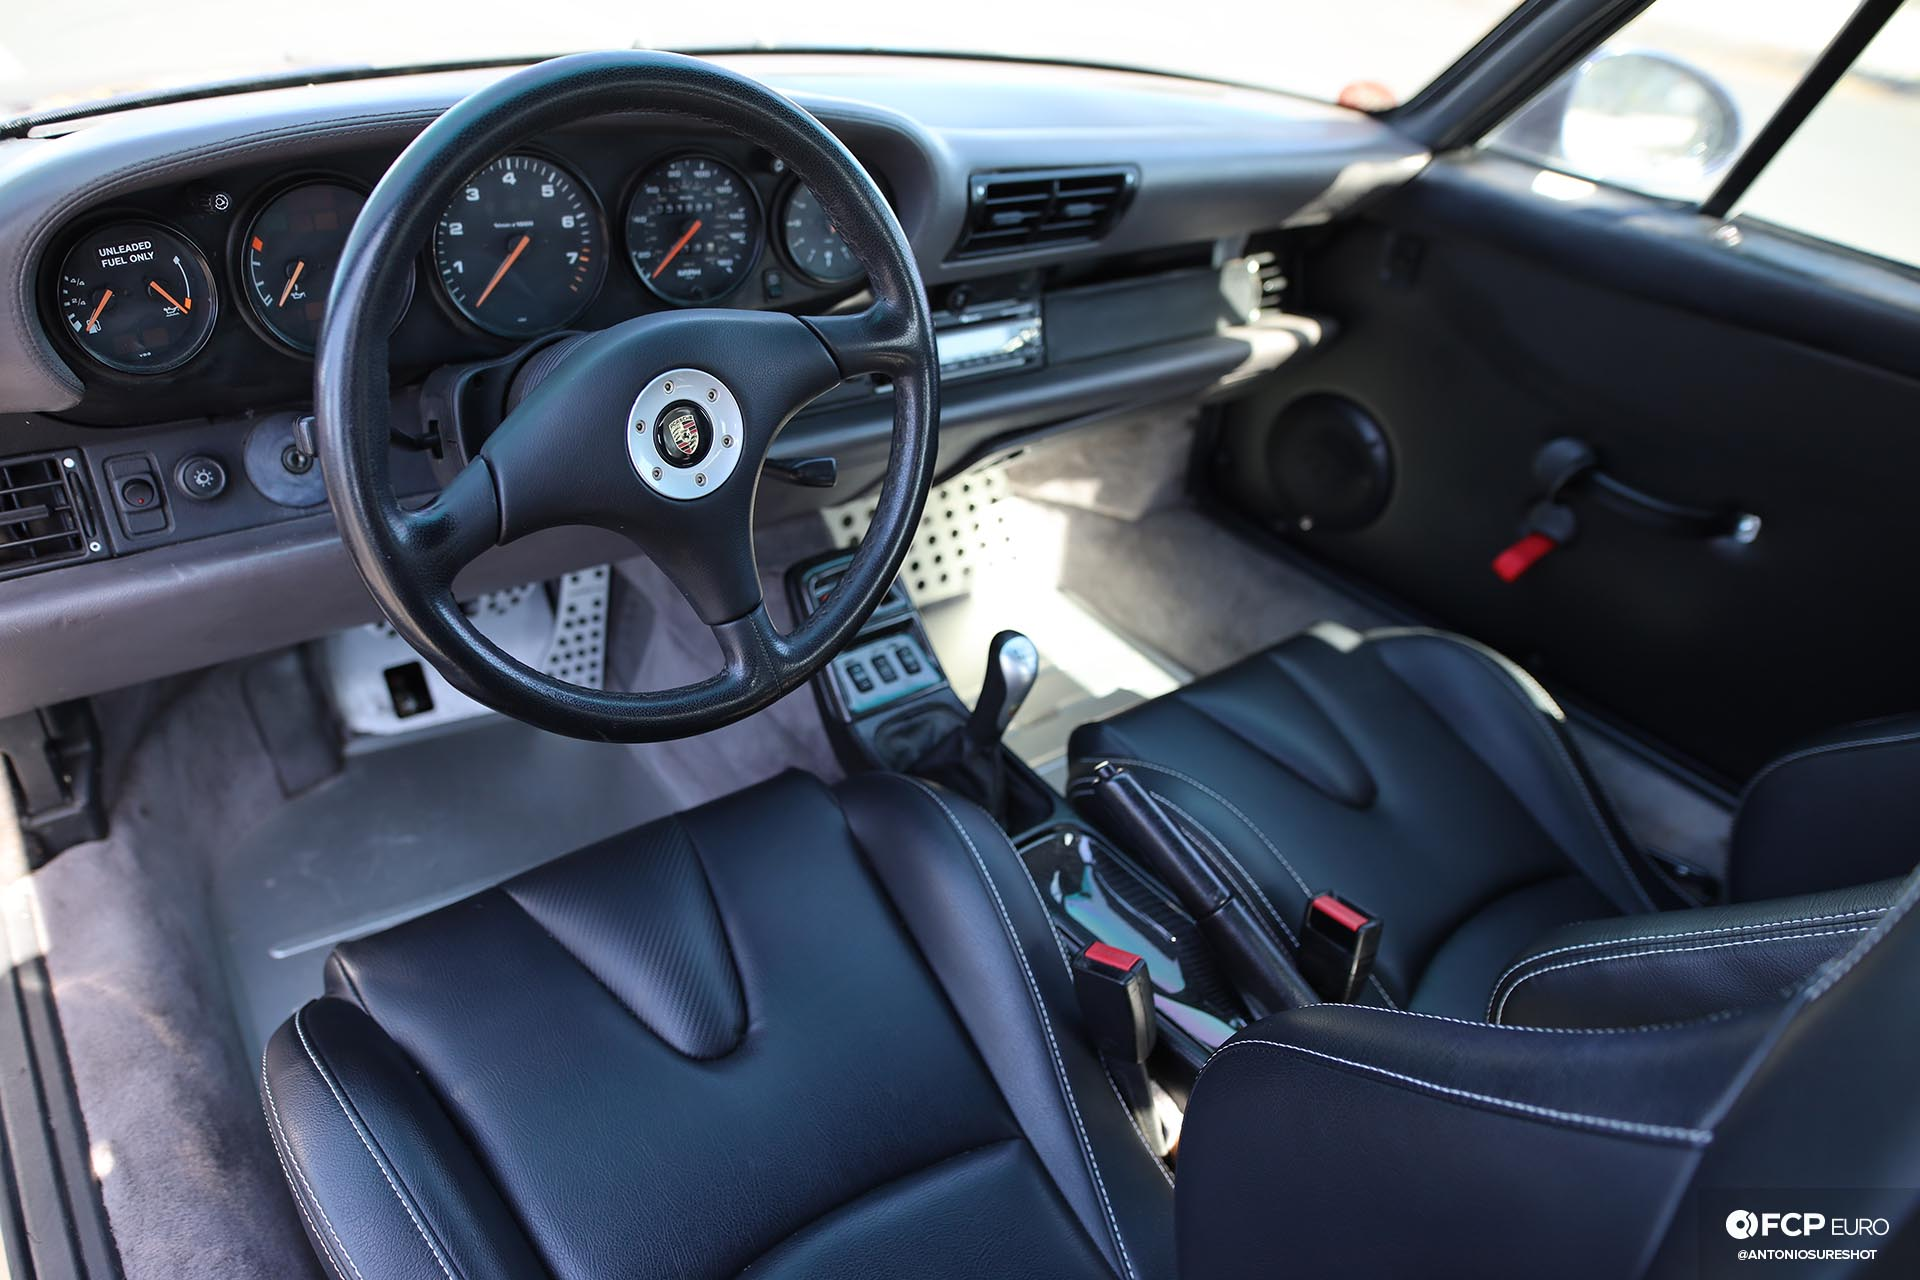 1996 Porsche 911 Carrera 993 RWB interior